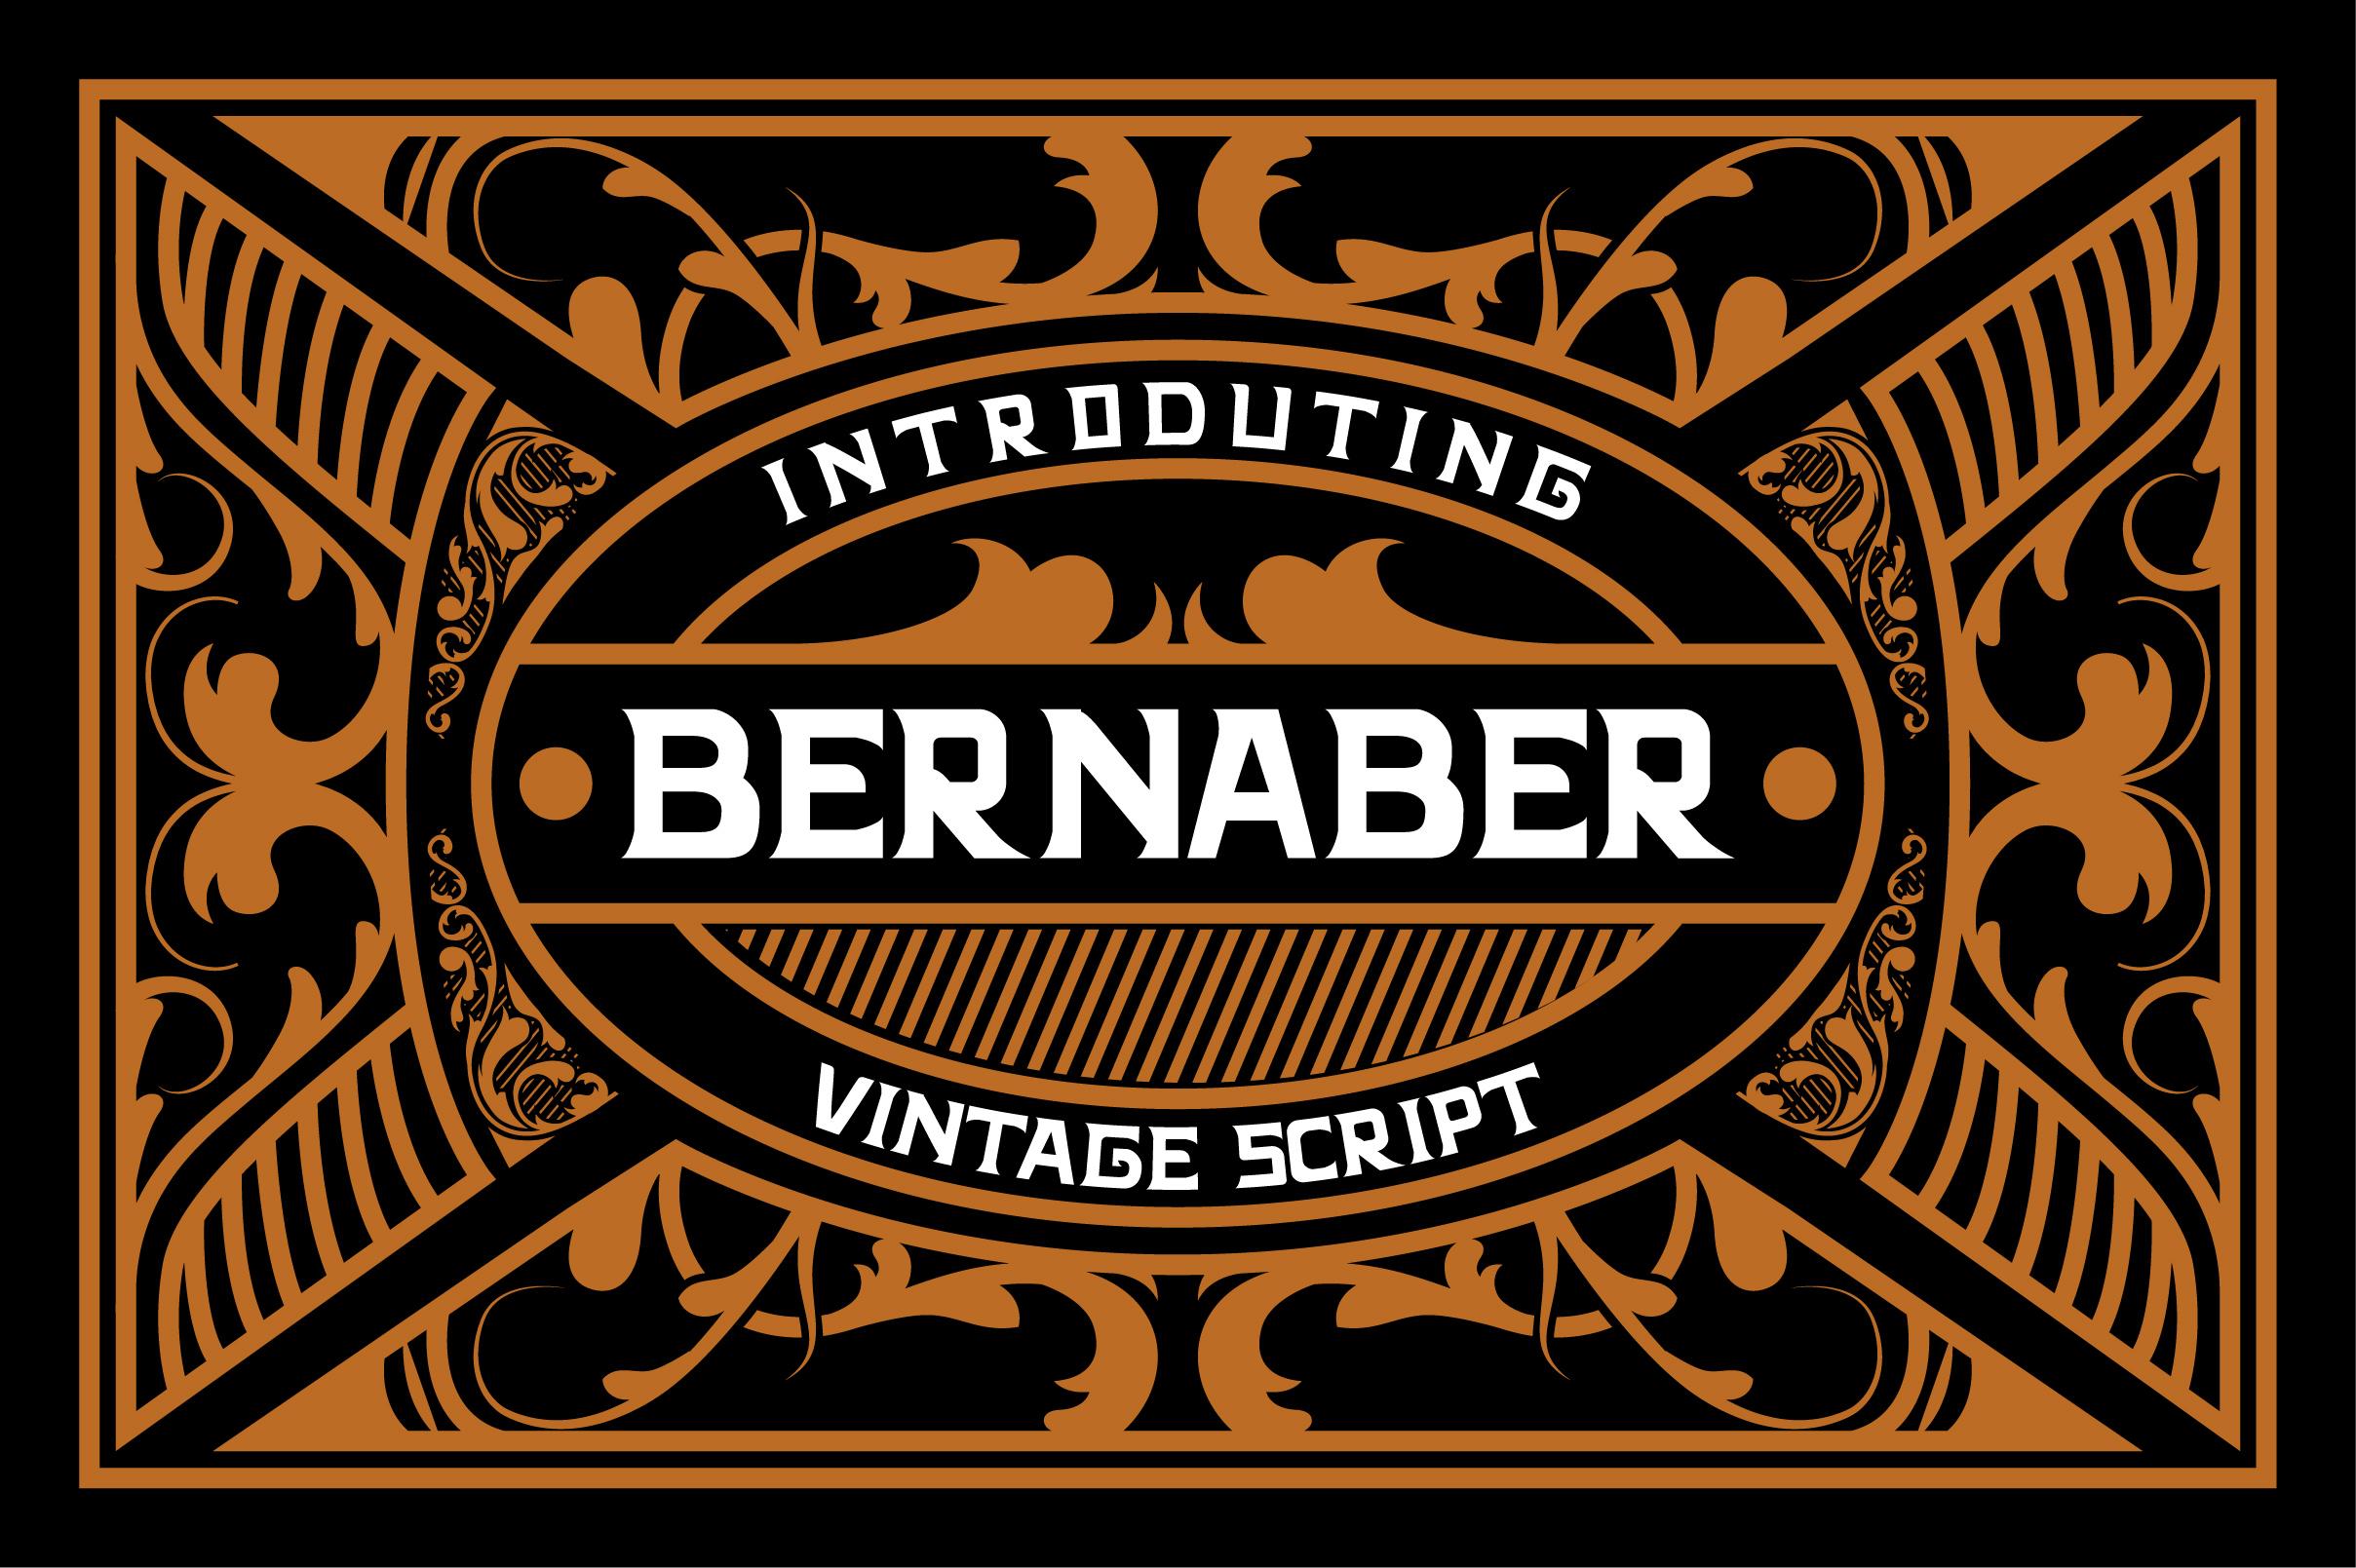 Bernaber